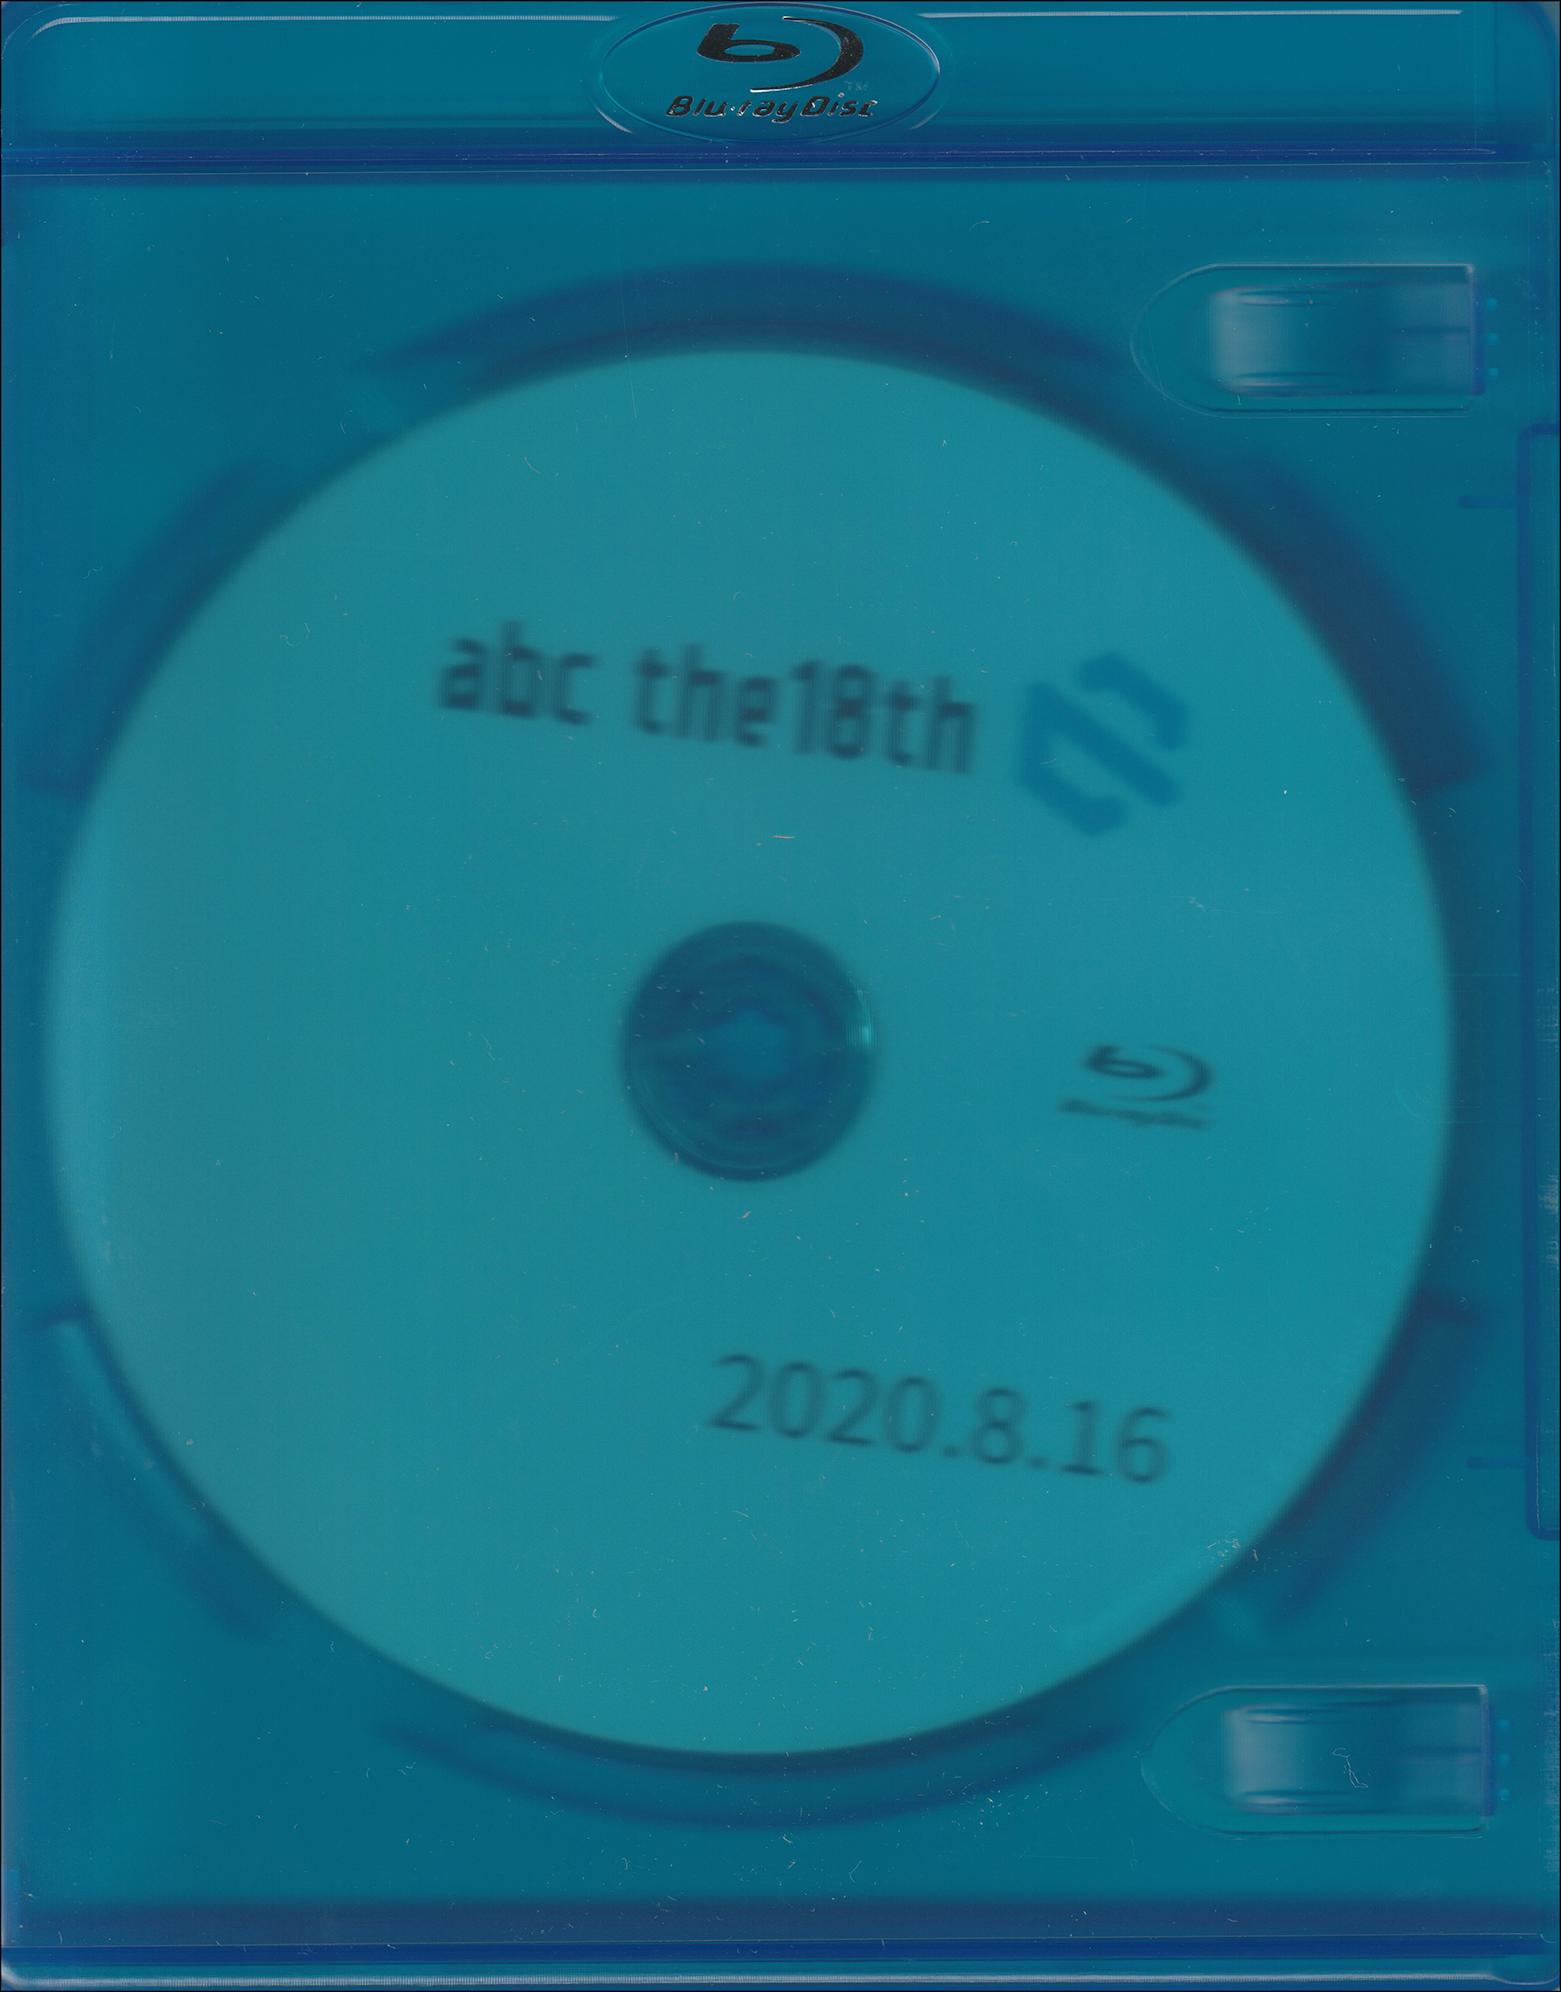 C22011903